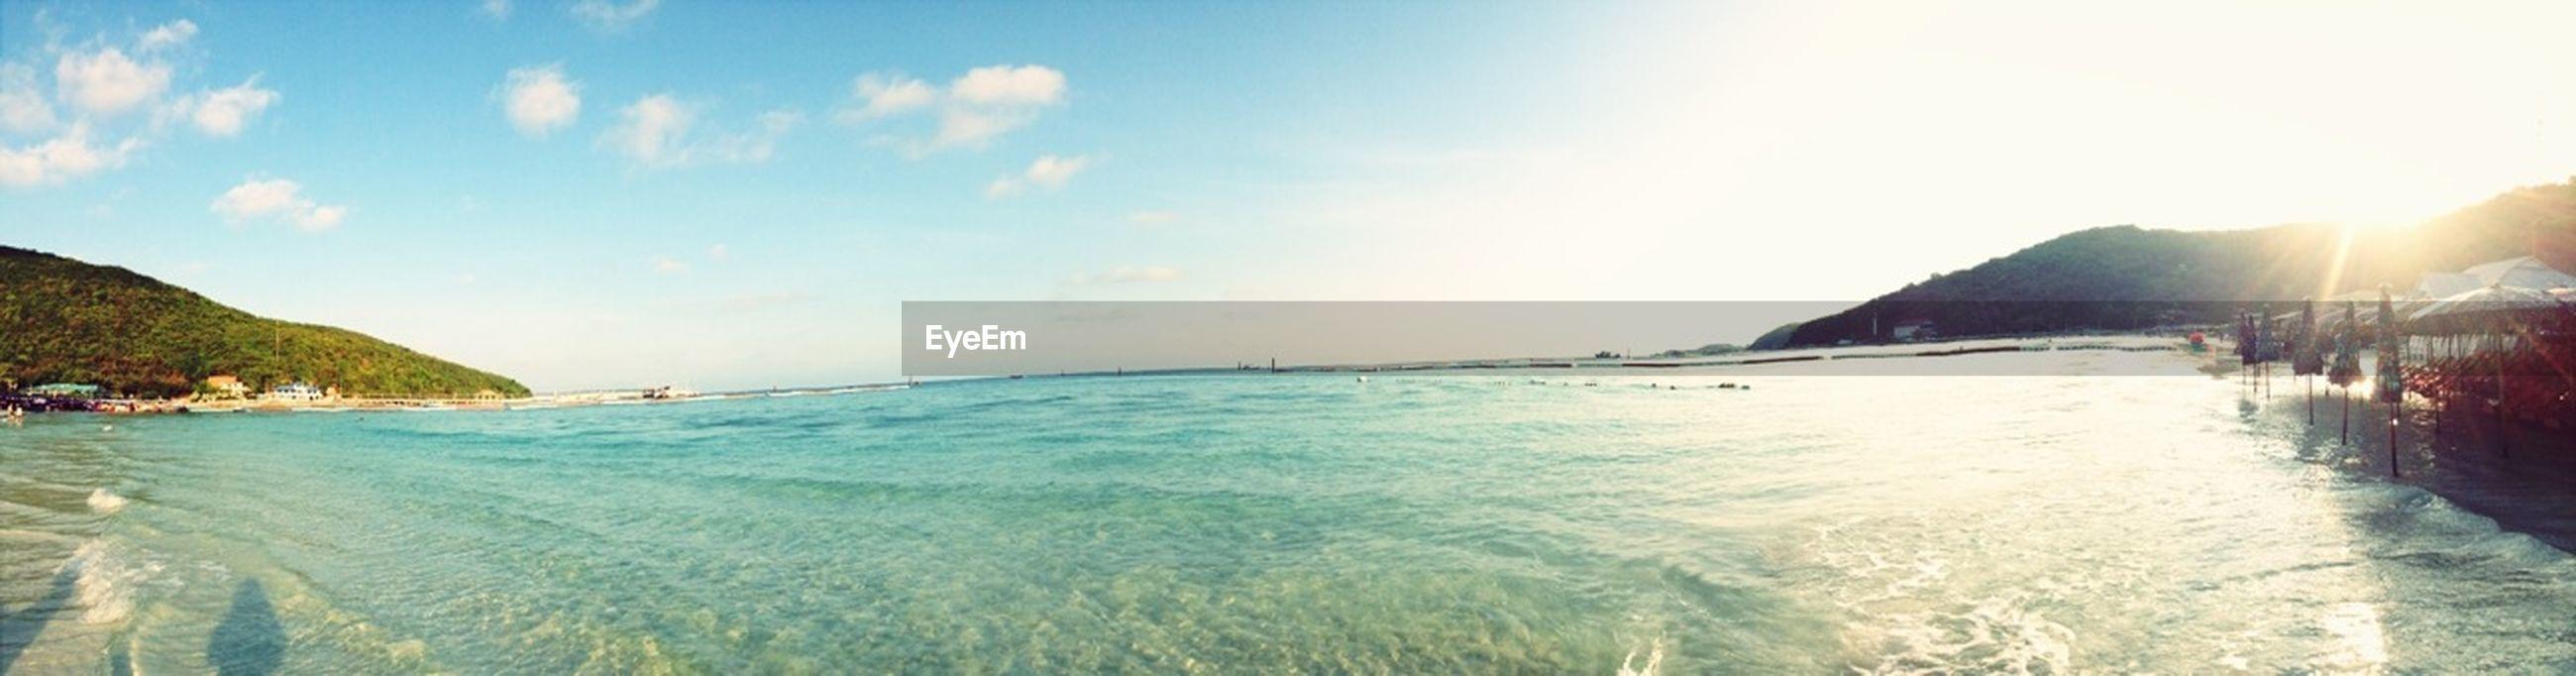 water, sea, sky, scenics, tranquil scene, beauty in nature, tranquility, beach, sun, sunlight, sunbeam, nature, mountain, lens flare, idyllic, horizon over water, panoramic, shore, nautical vessel, sunny